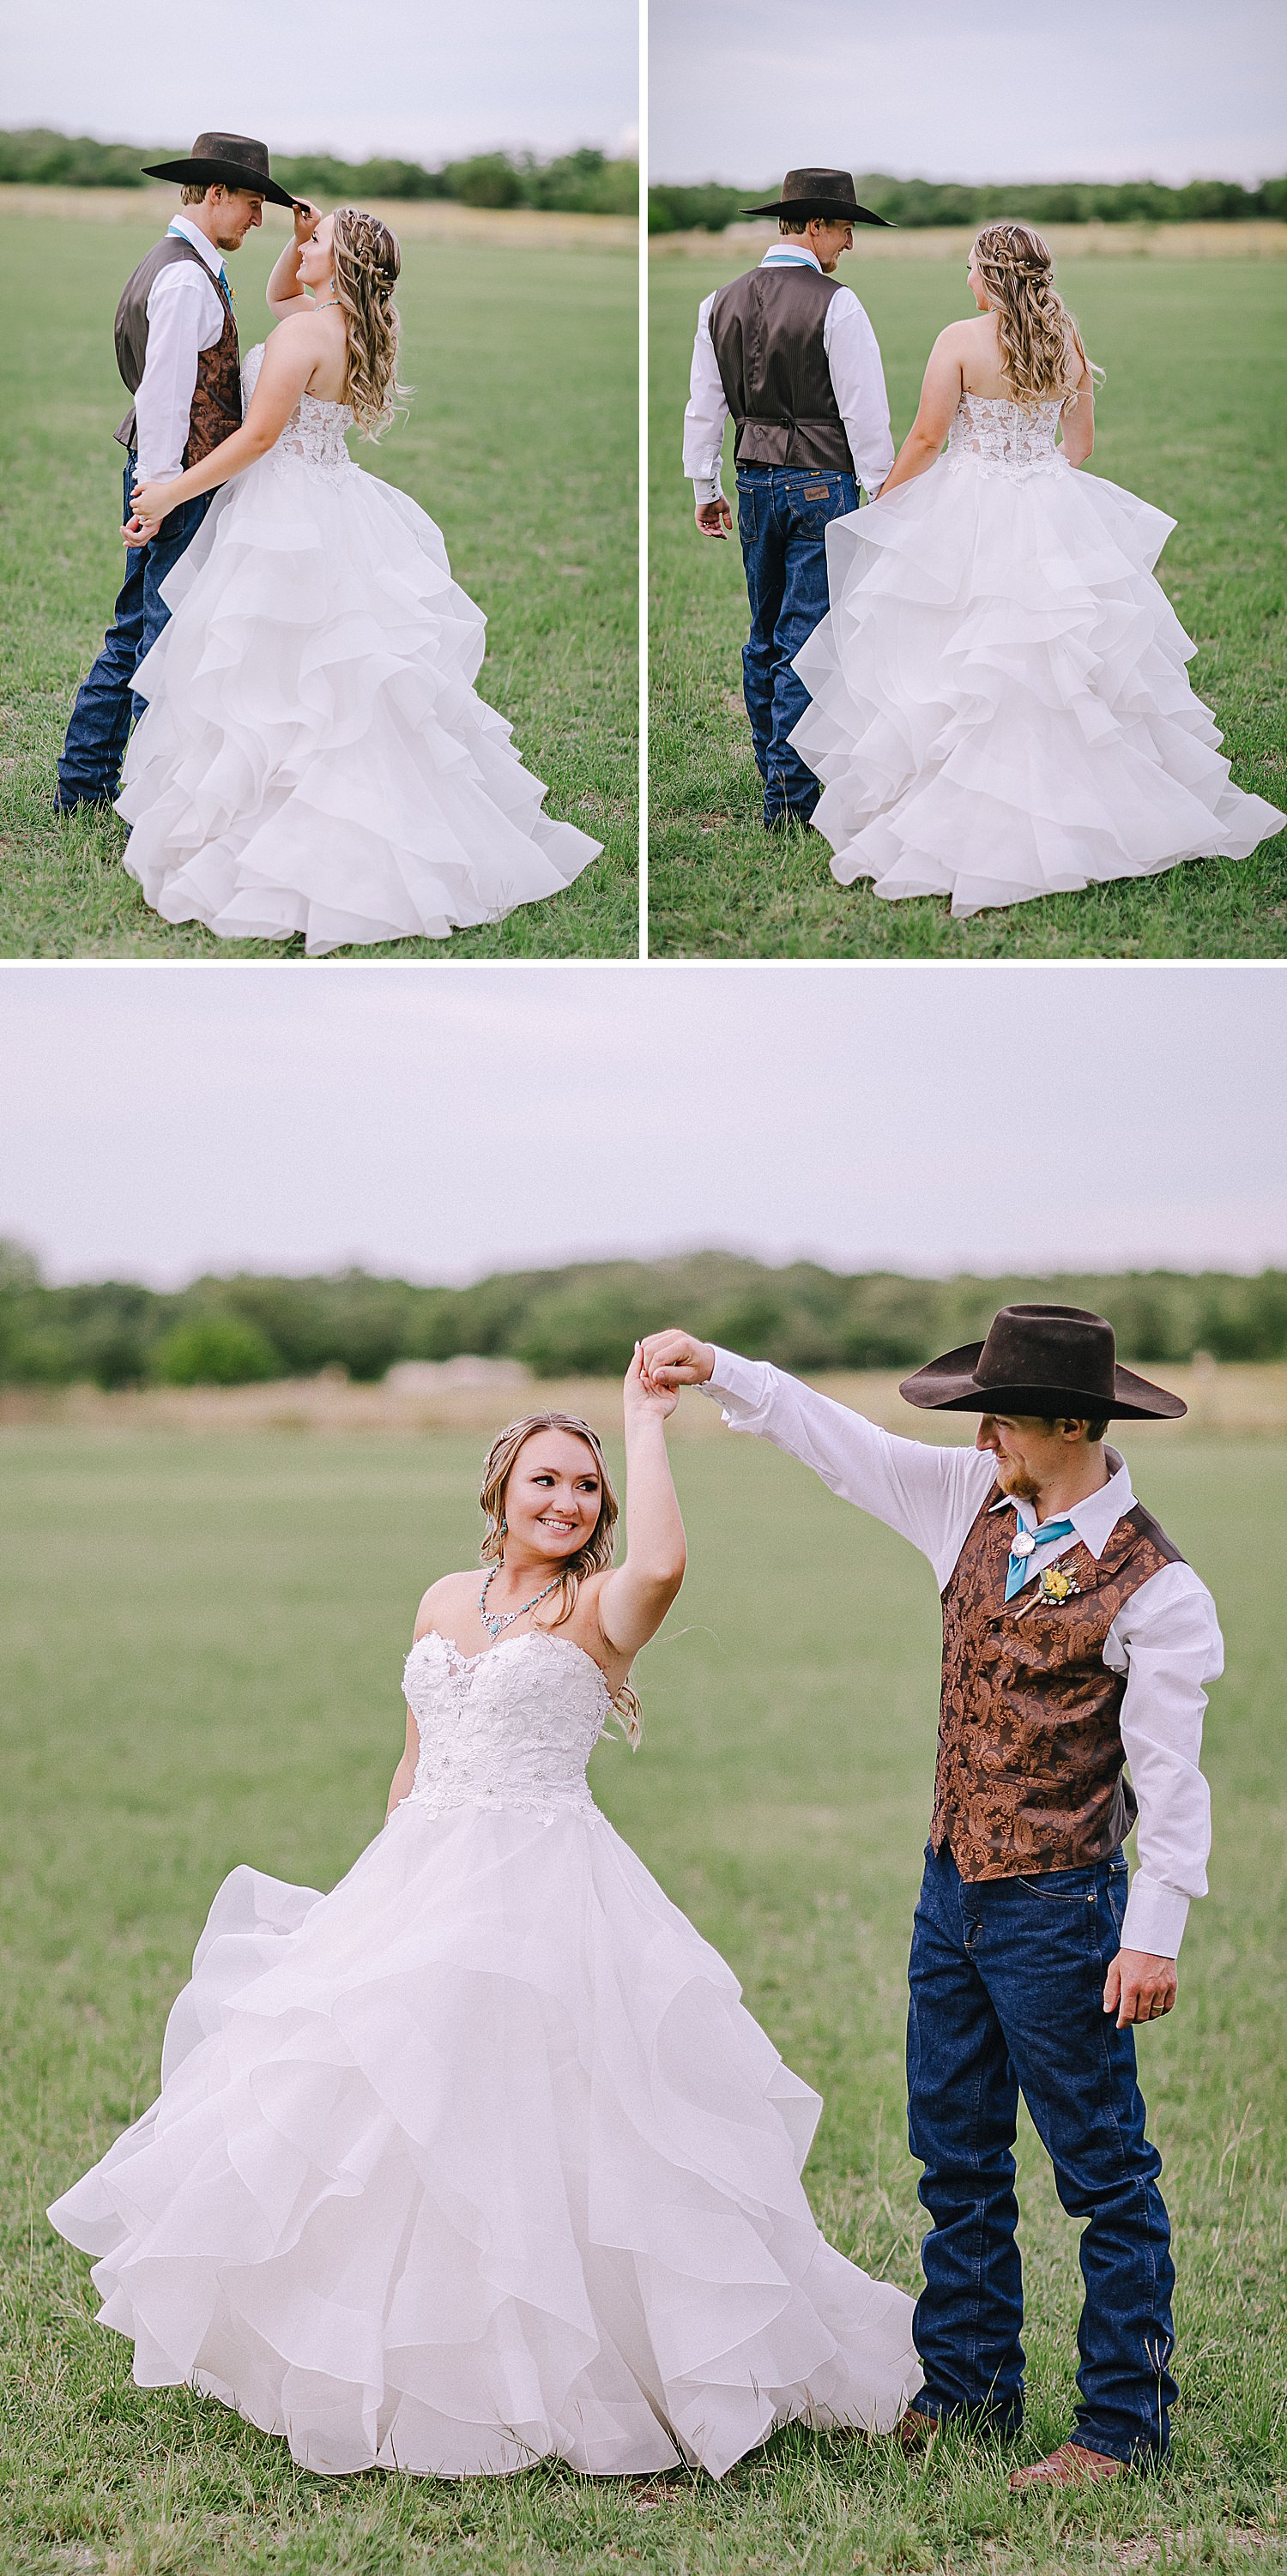 Carly-Barton-Photography-Old-Town-Texas-Rustic-Wedding-Photos-Sunflowers-Boots-Kyle-Texas_0068.jpg